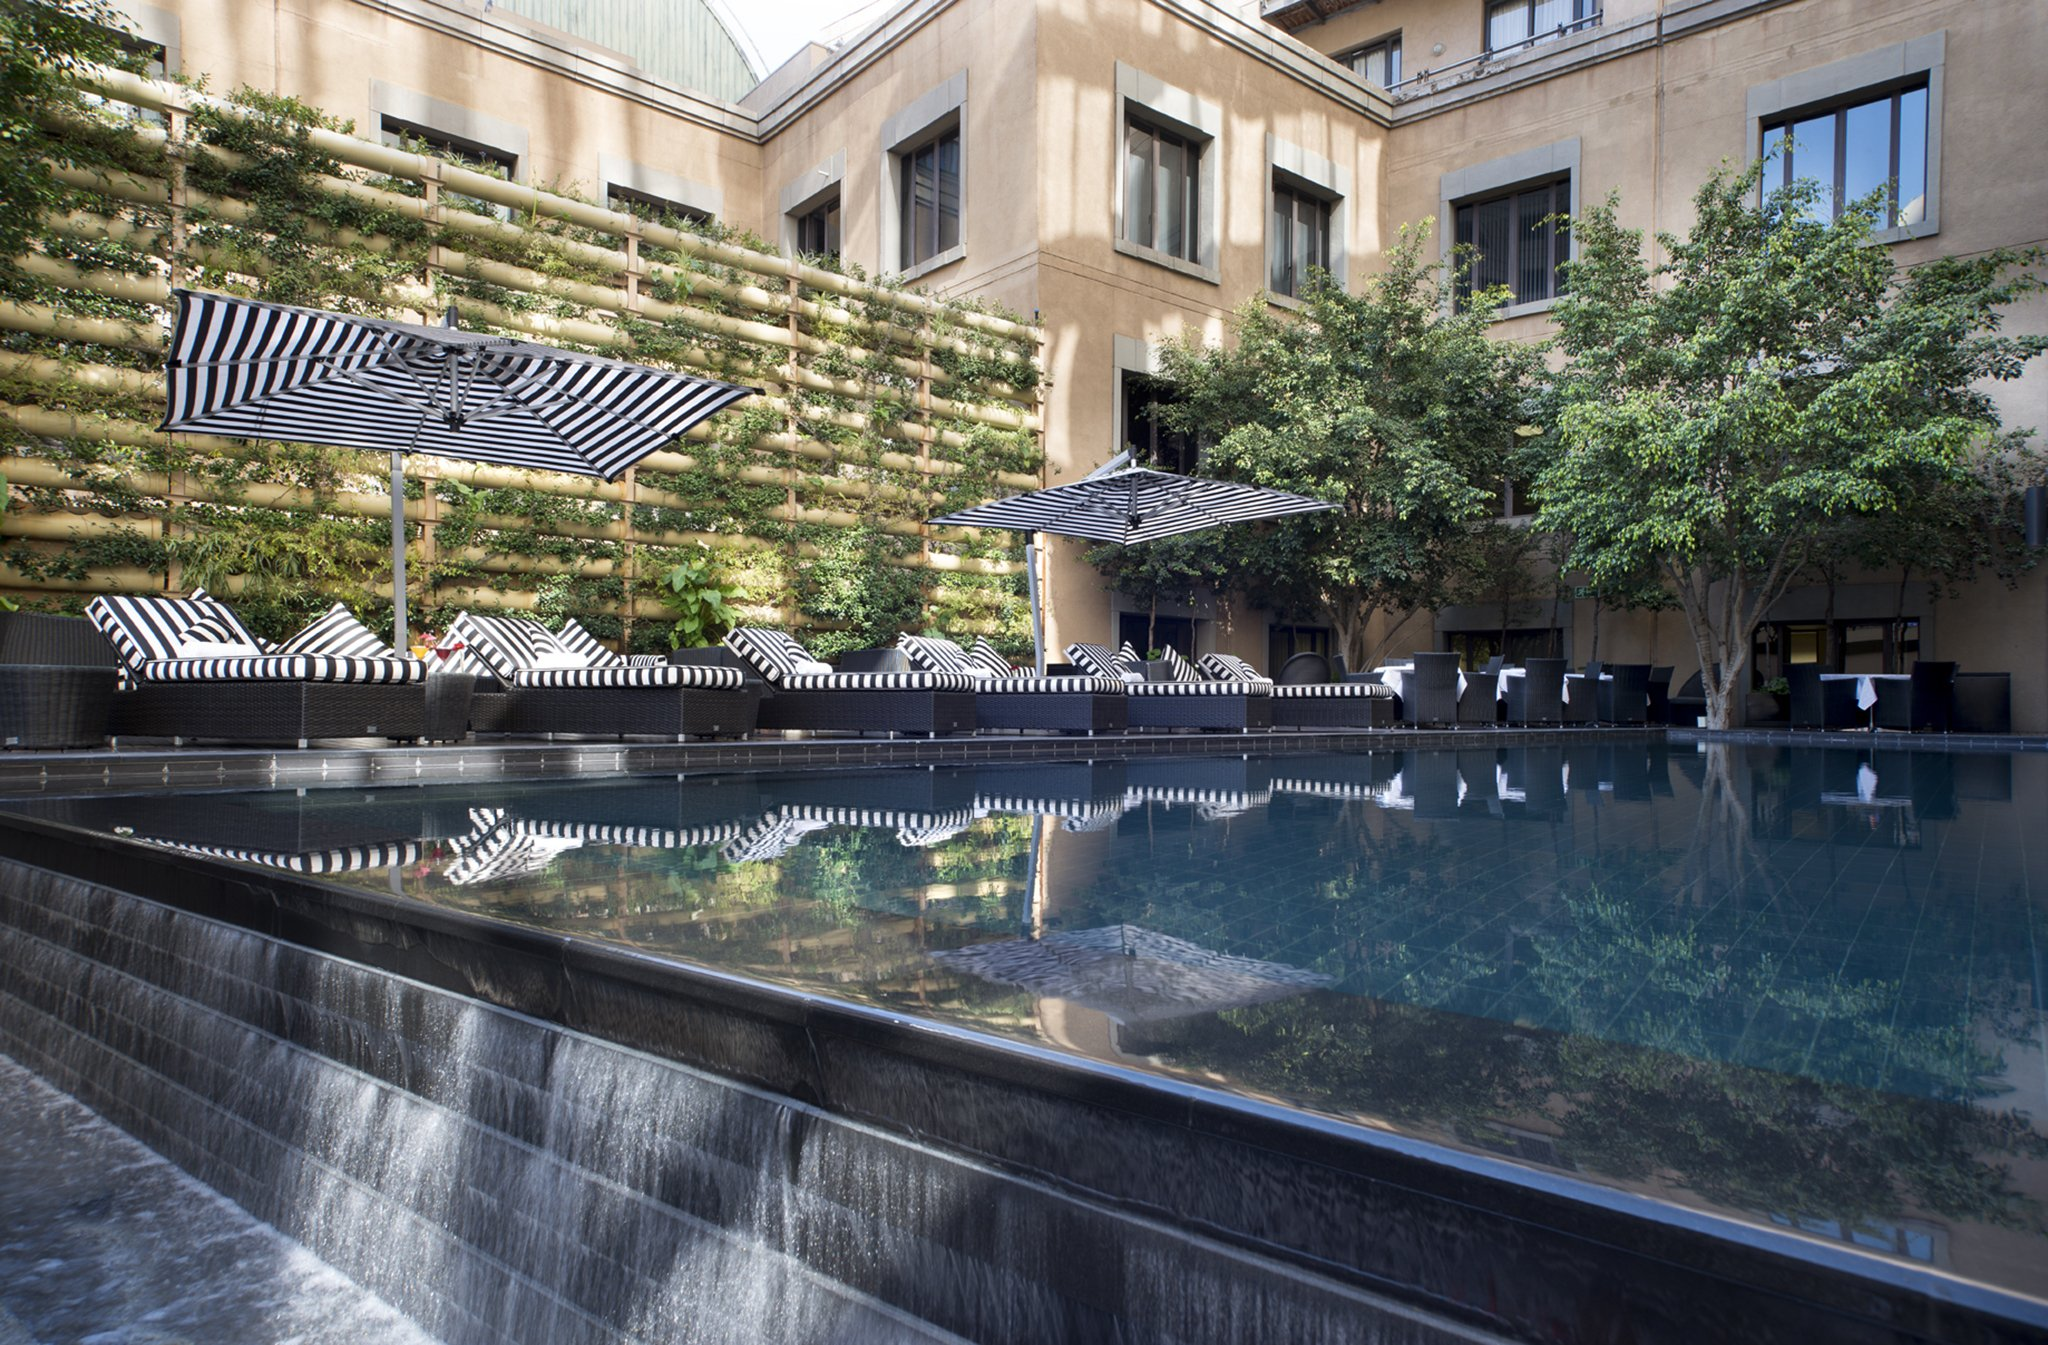 DaVinci Hotel & Suites